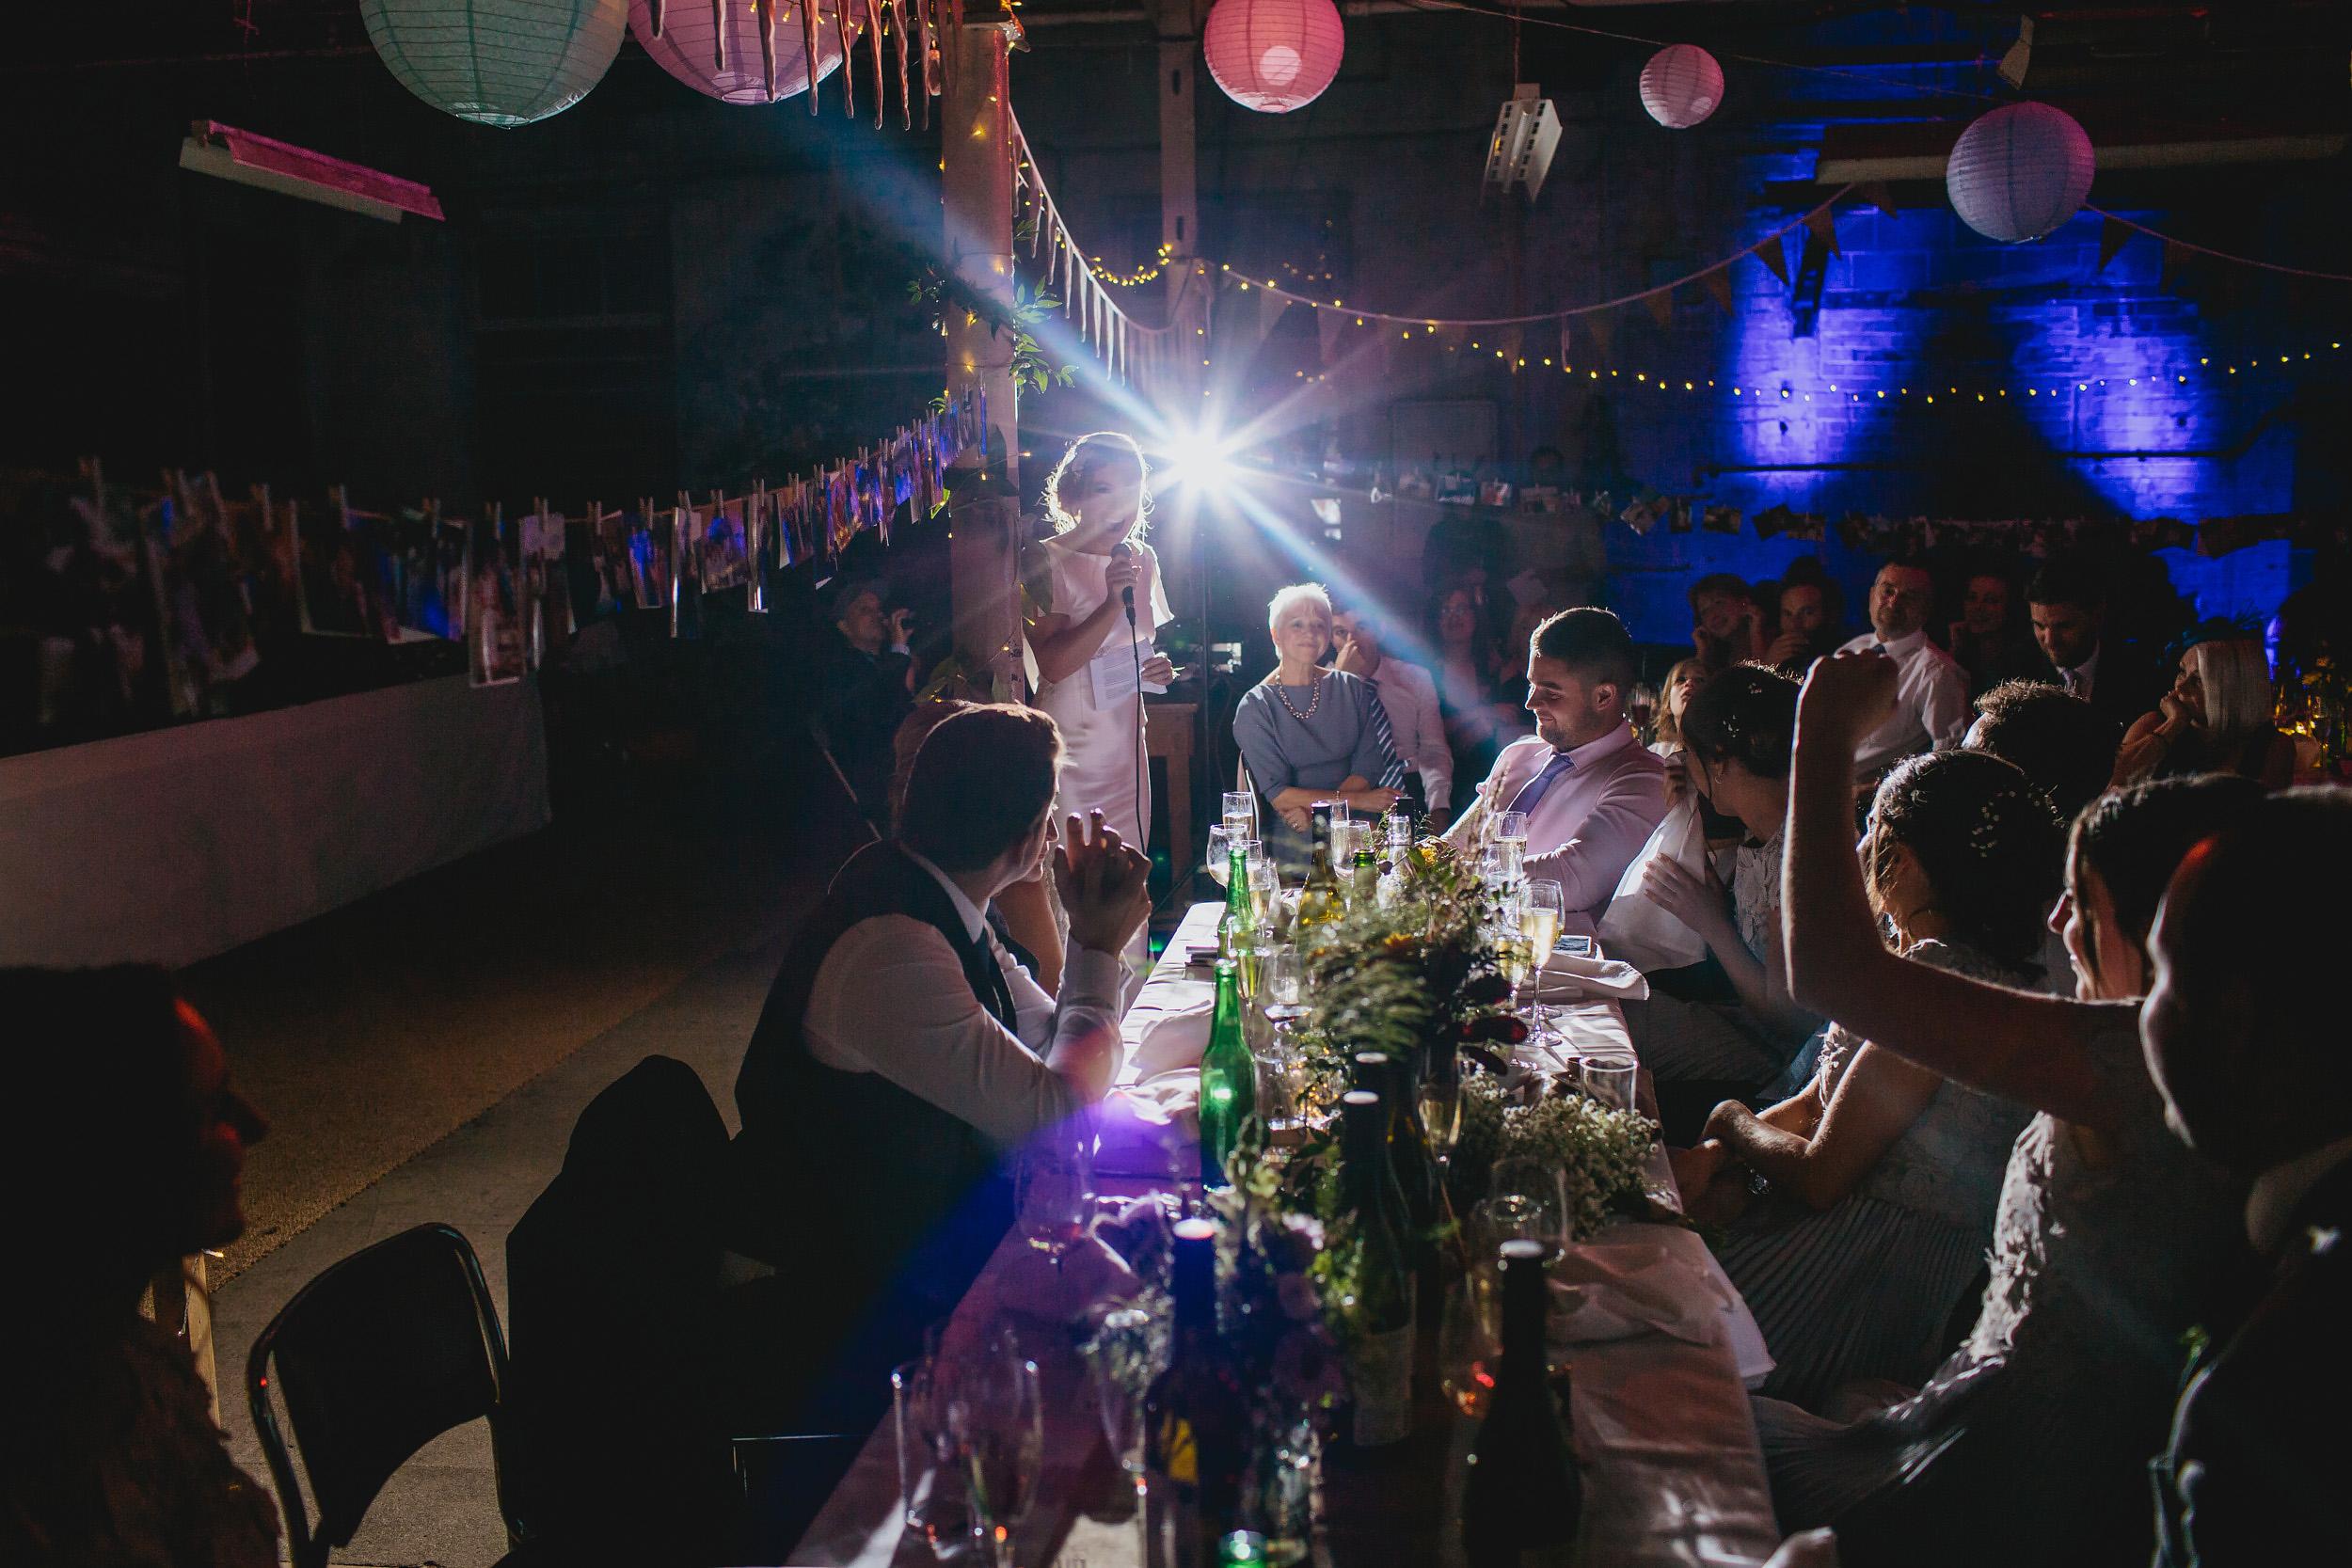 Brides speech at her wedding at Sunny Bank Mills Leeds